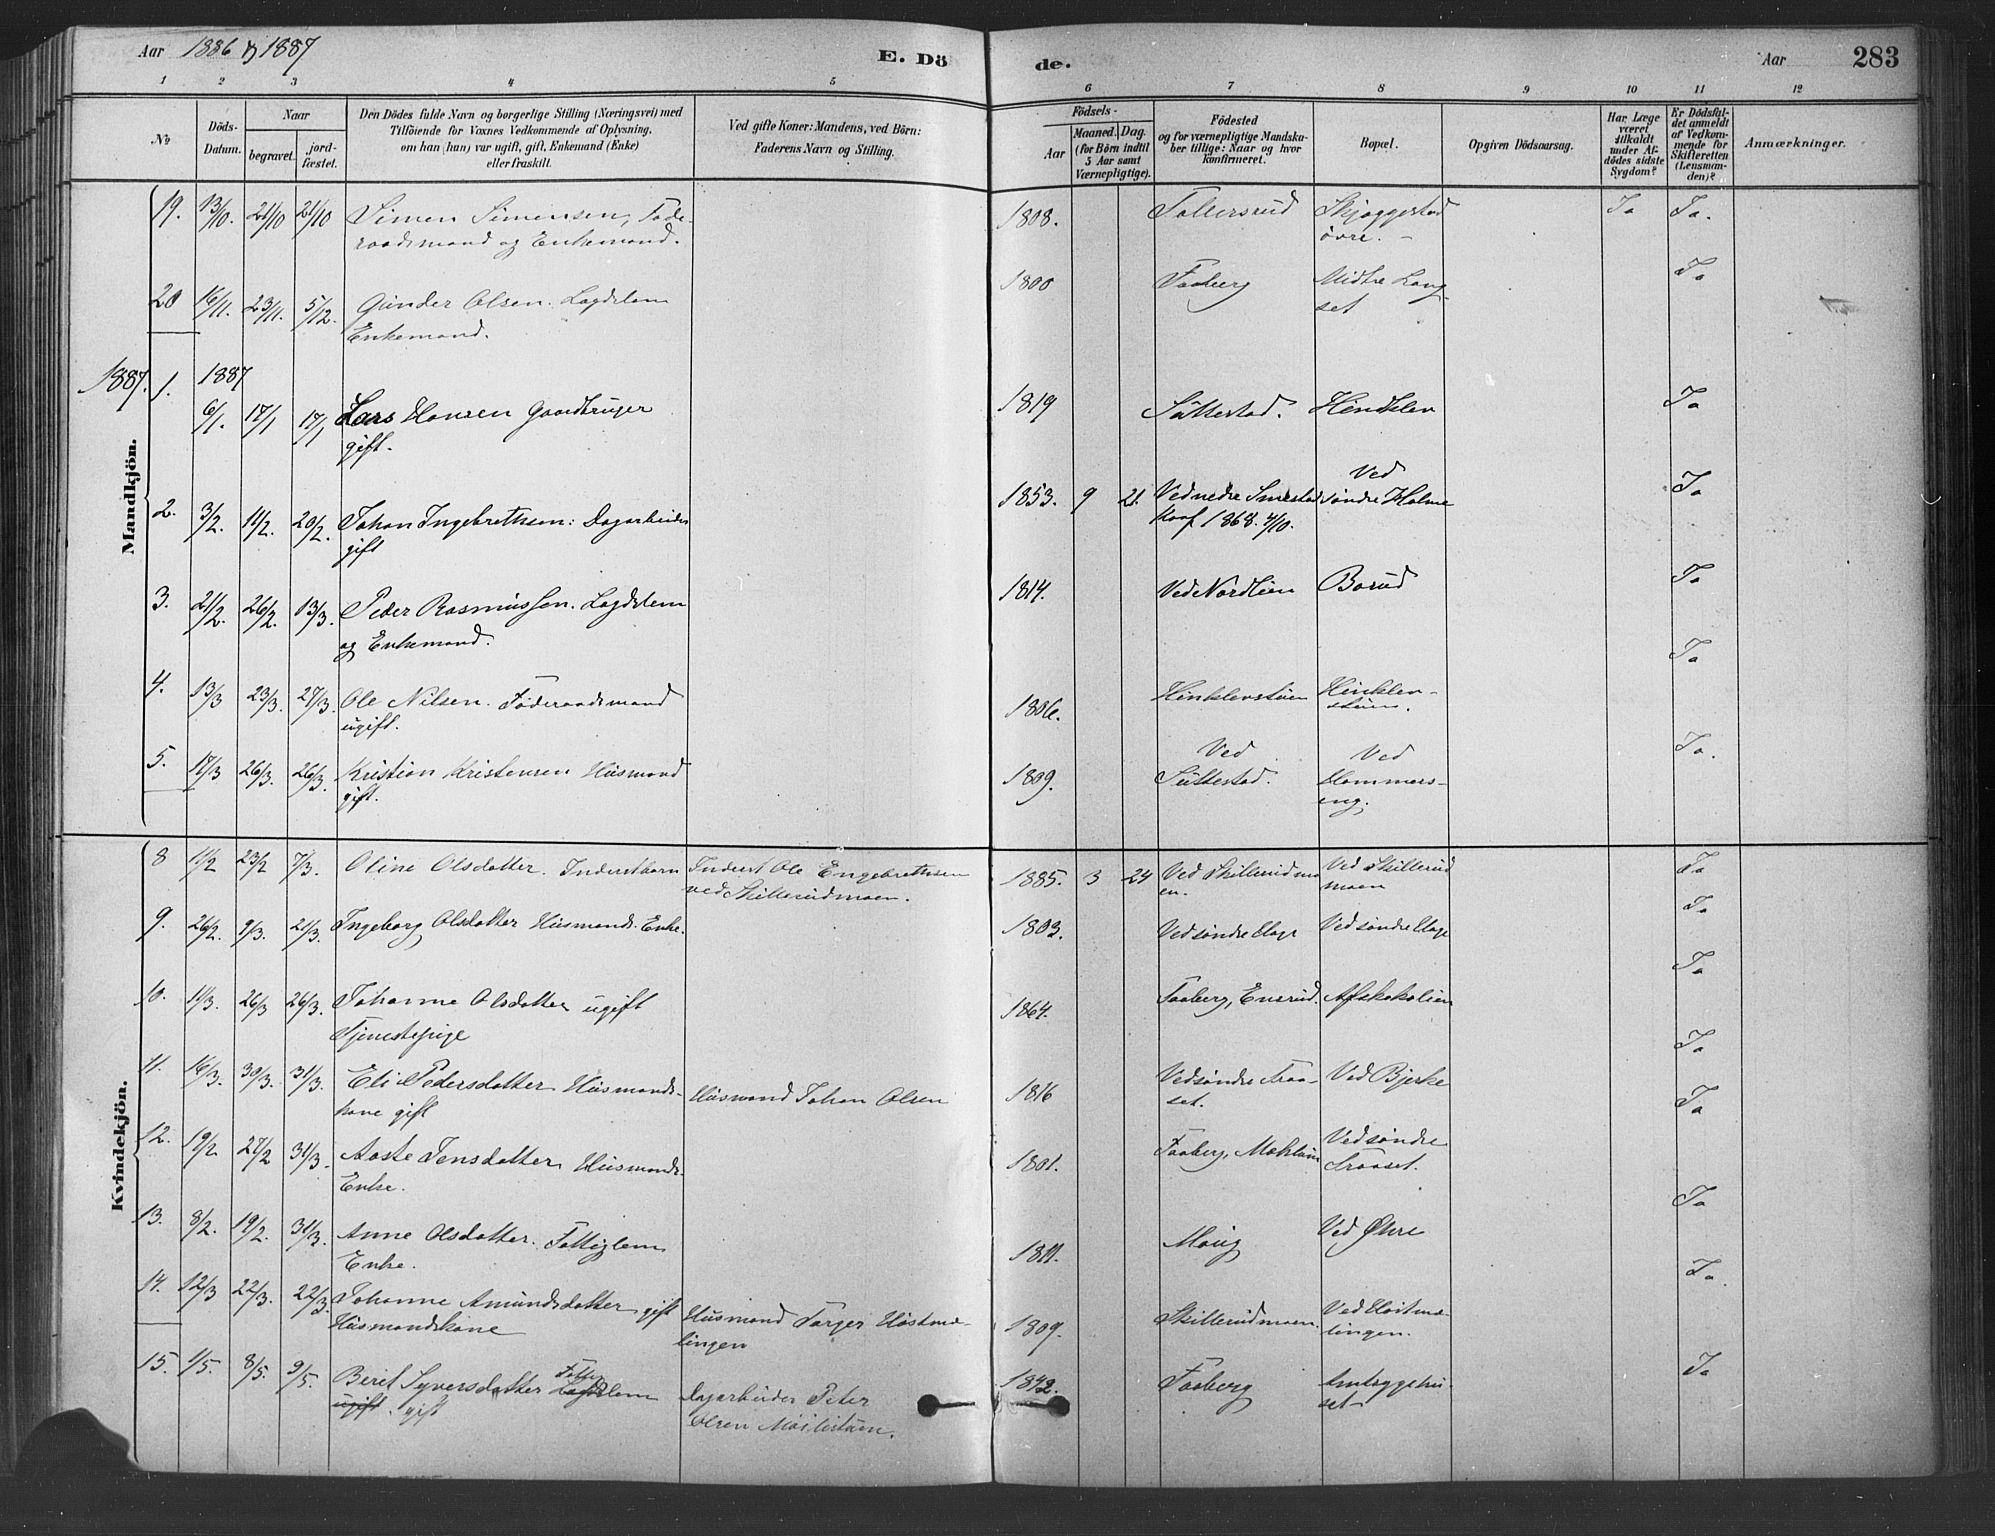 SAH, Fåberg prestekontor, Ministerialbok nr. 9, 1879-1898, s. 283